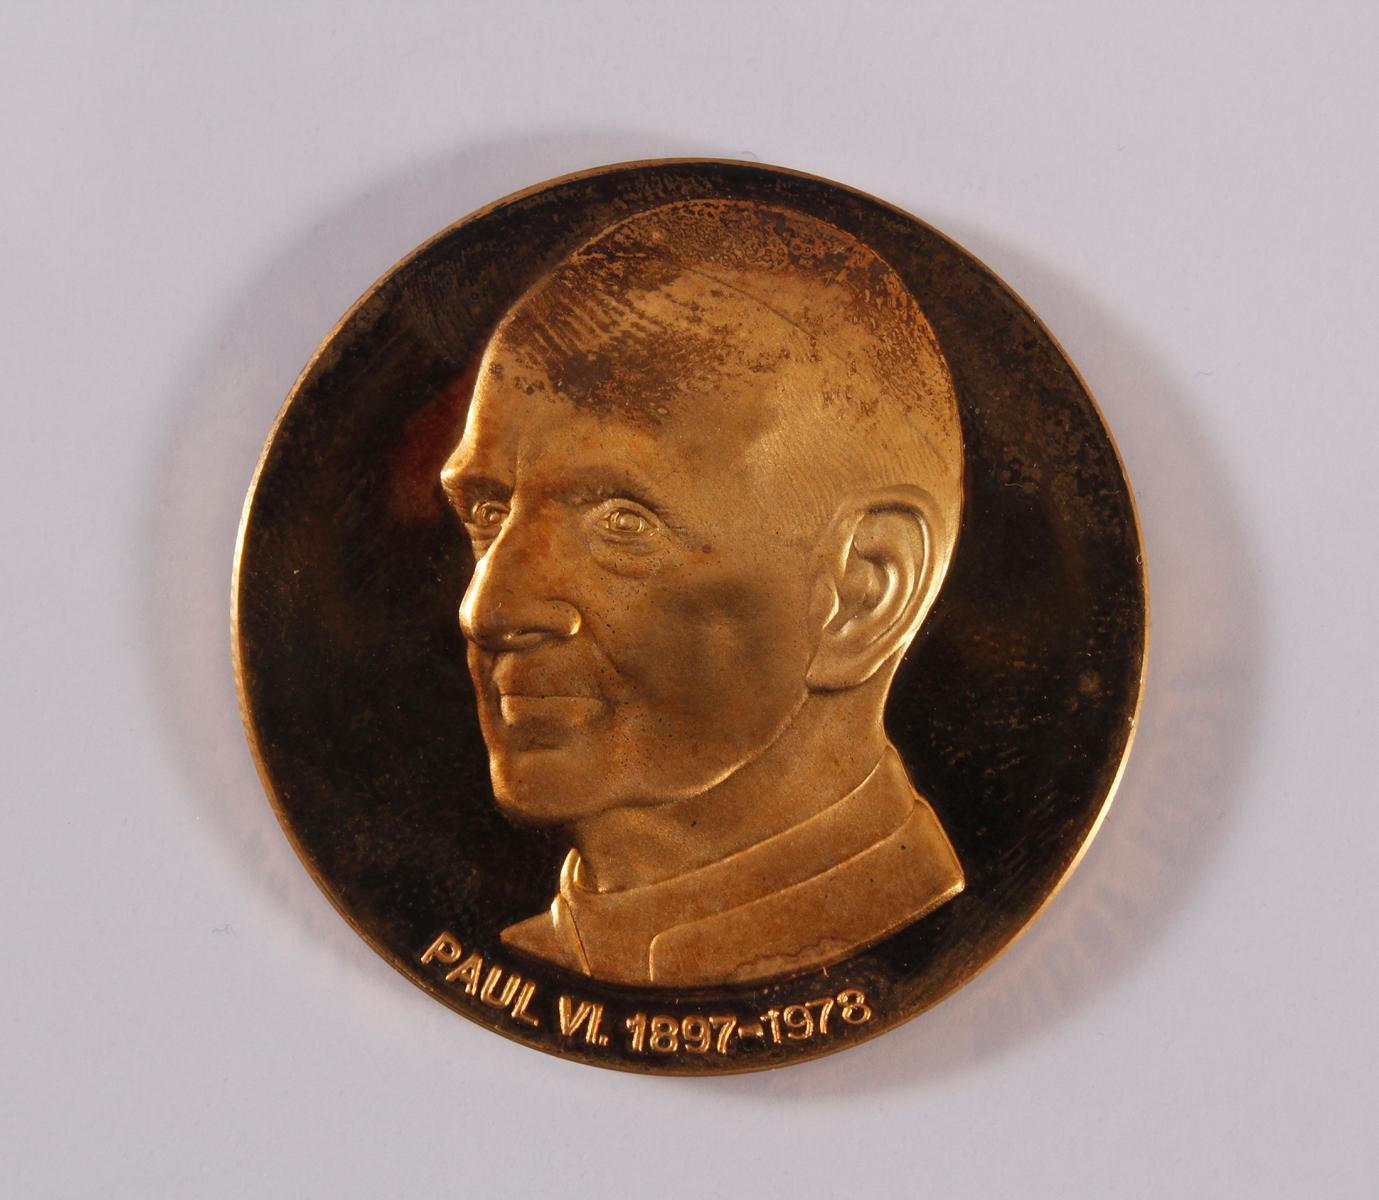 Goldemedaille Paul VI. 1897 – 1978